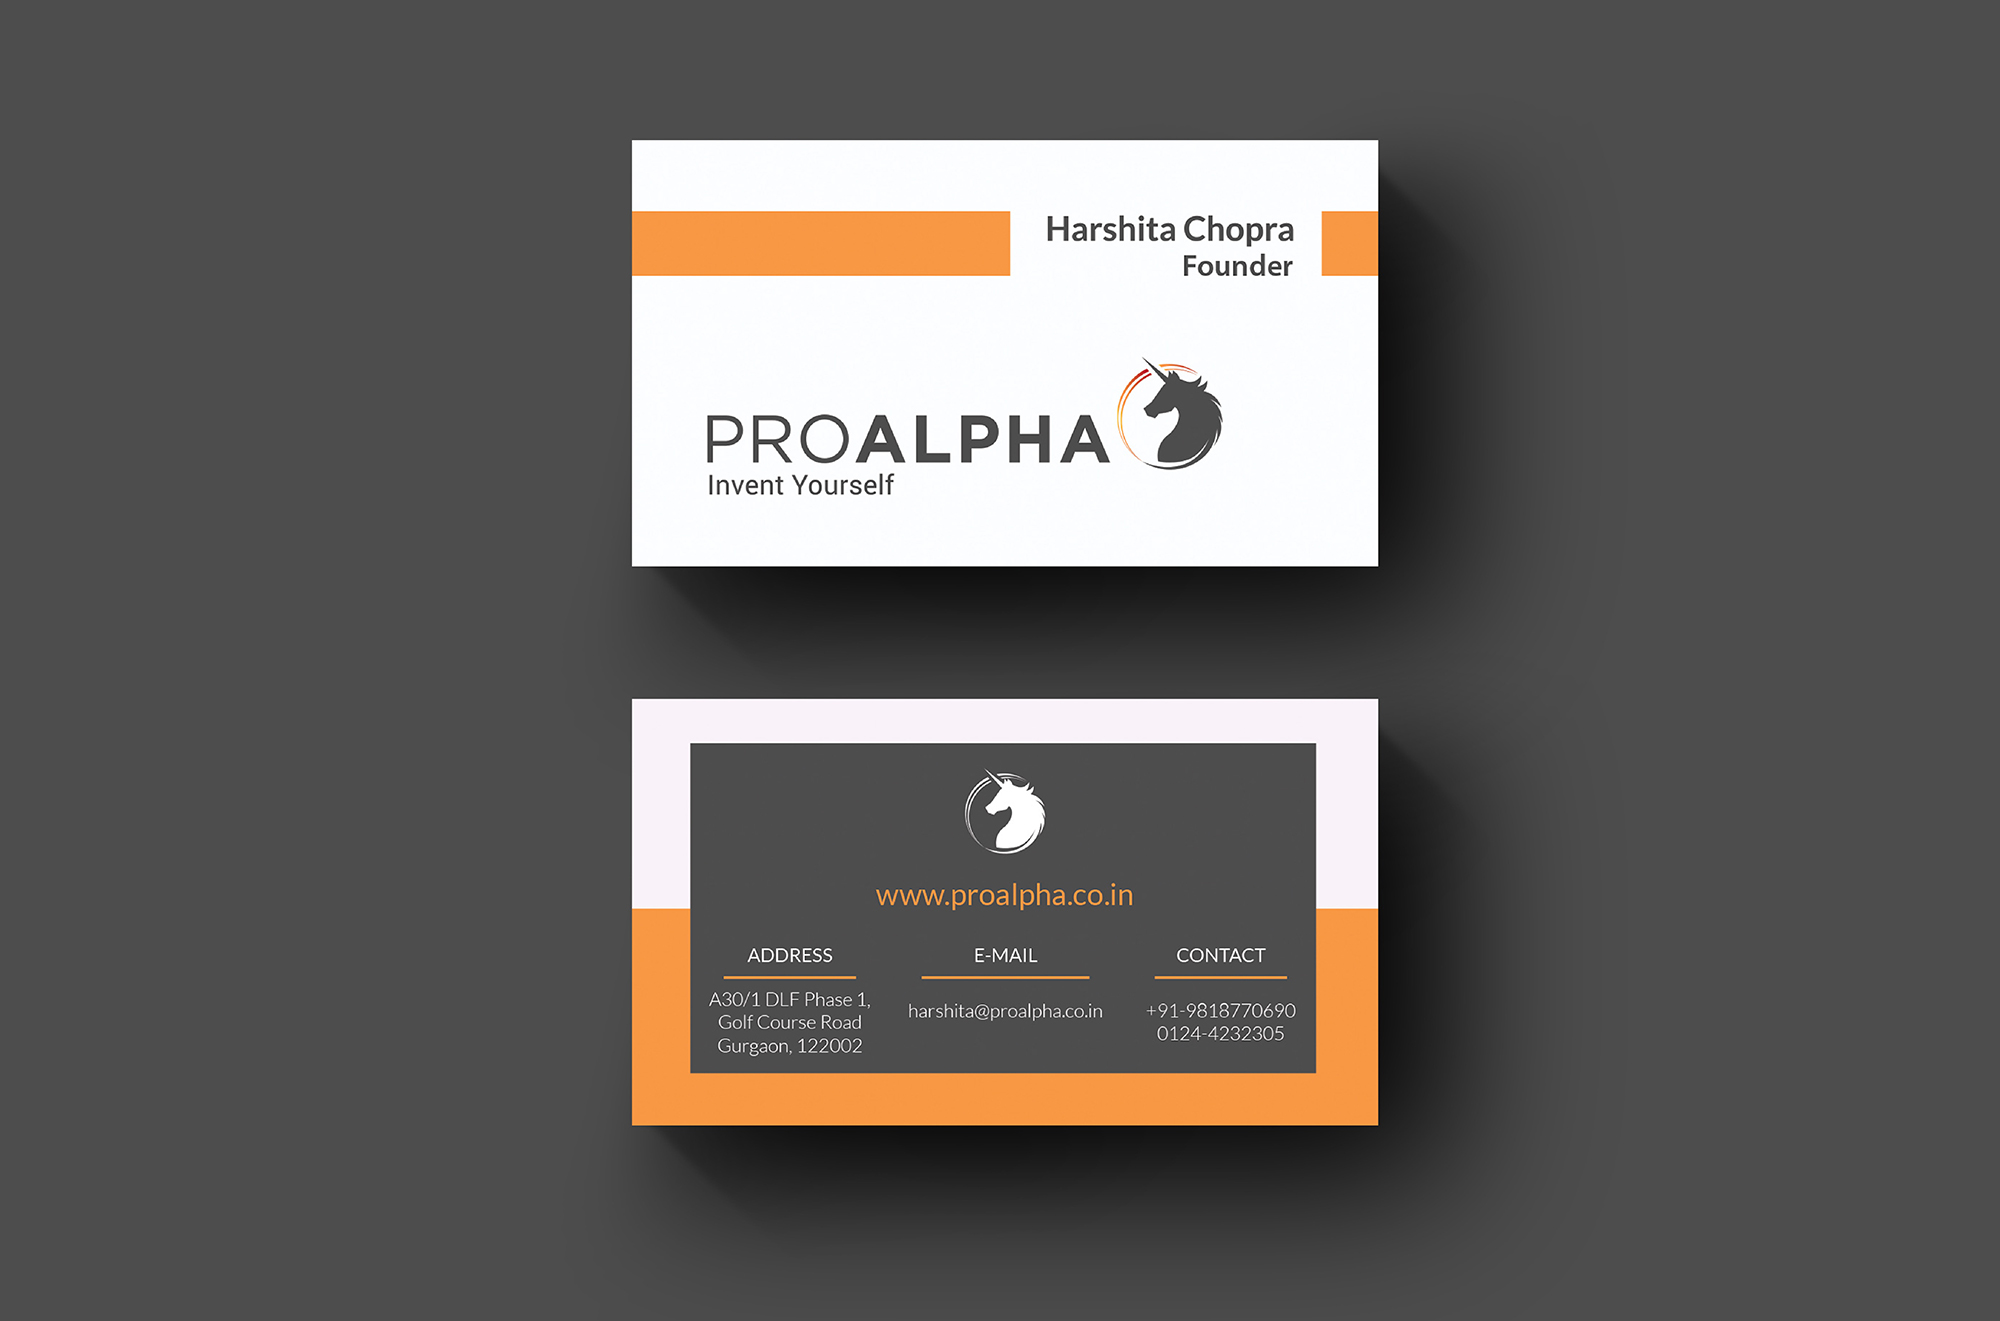 Proalpha contact details